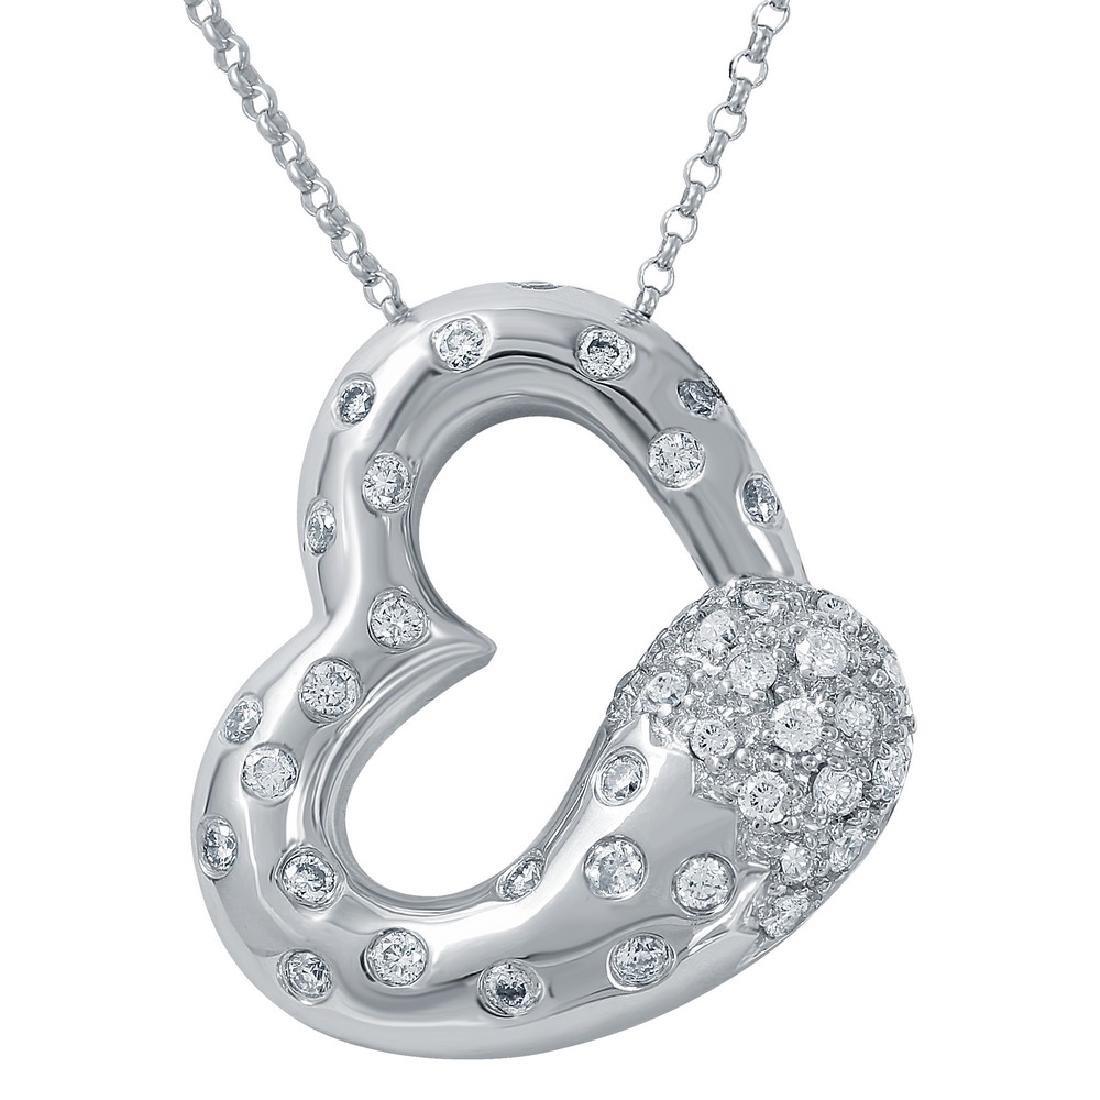 Genuine 0.7 TCW 14K White Gold Ladies Necklace